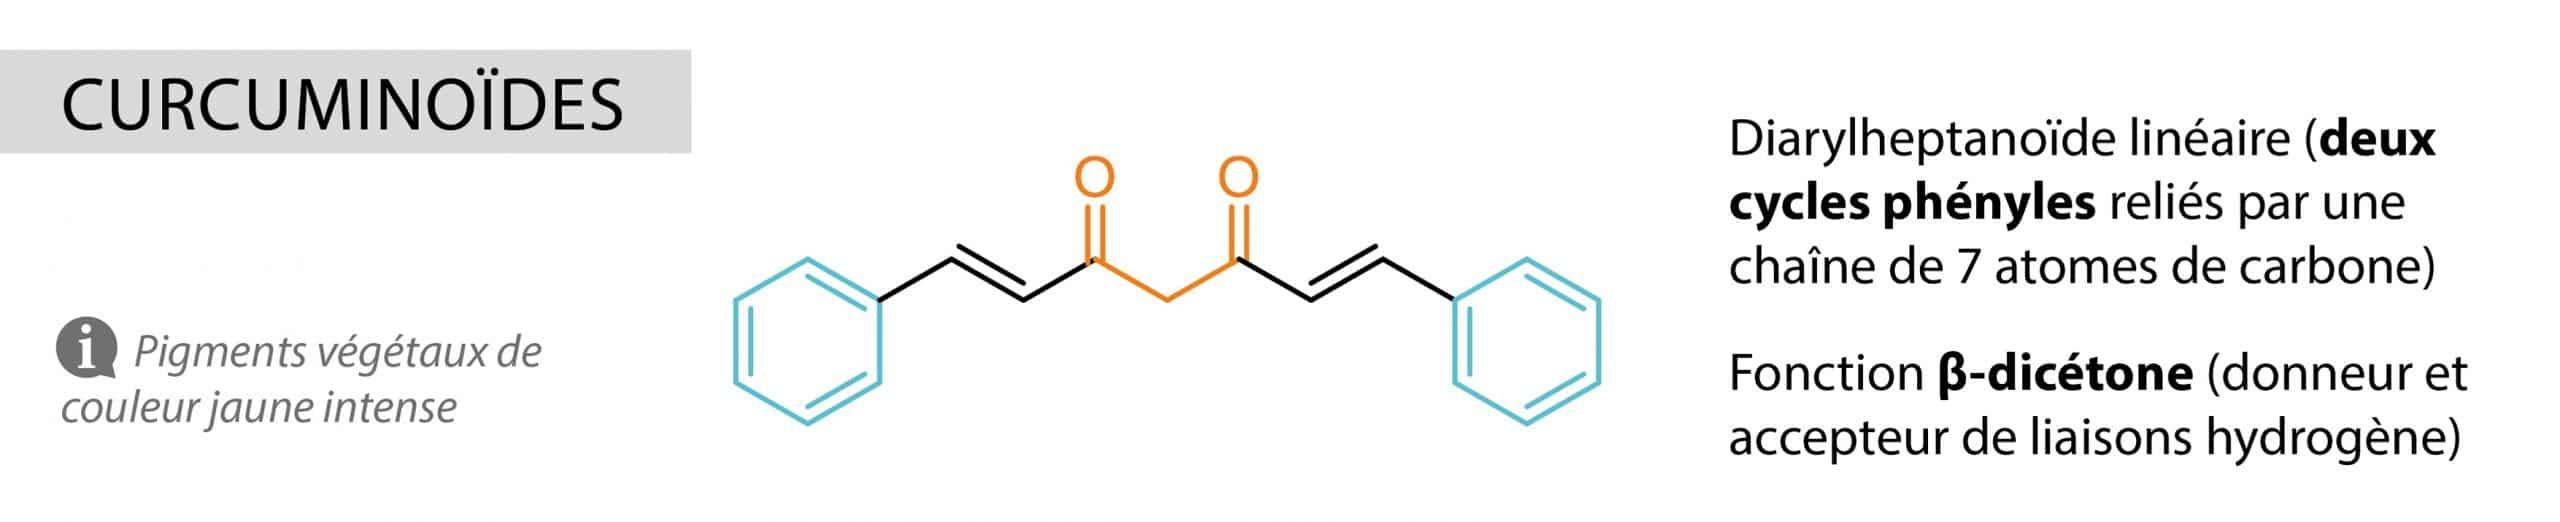 curcuminoides Nutrixeal Info